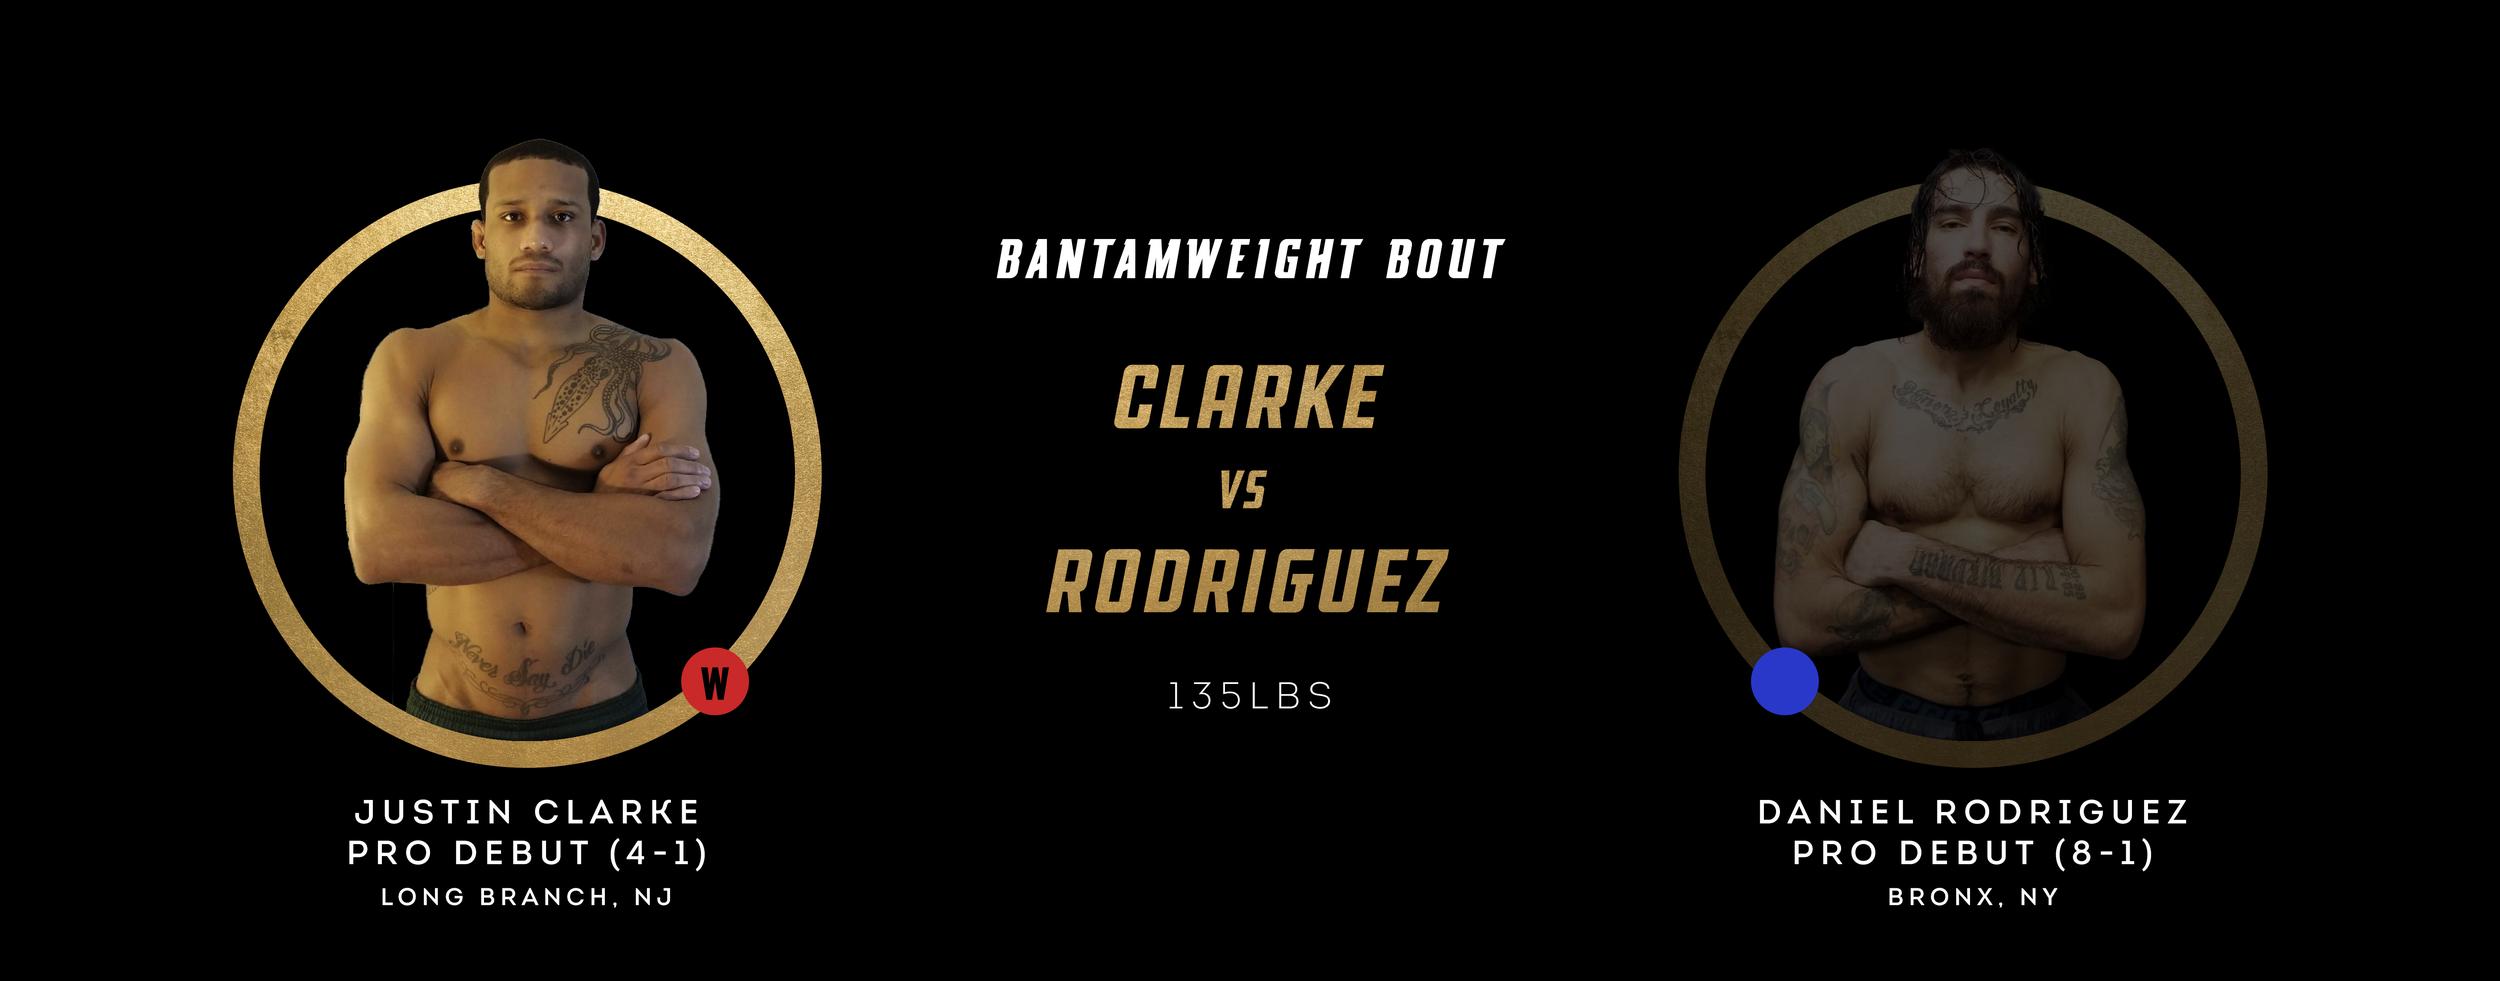 Clarke_VS_Rodriguez_W.png